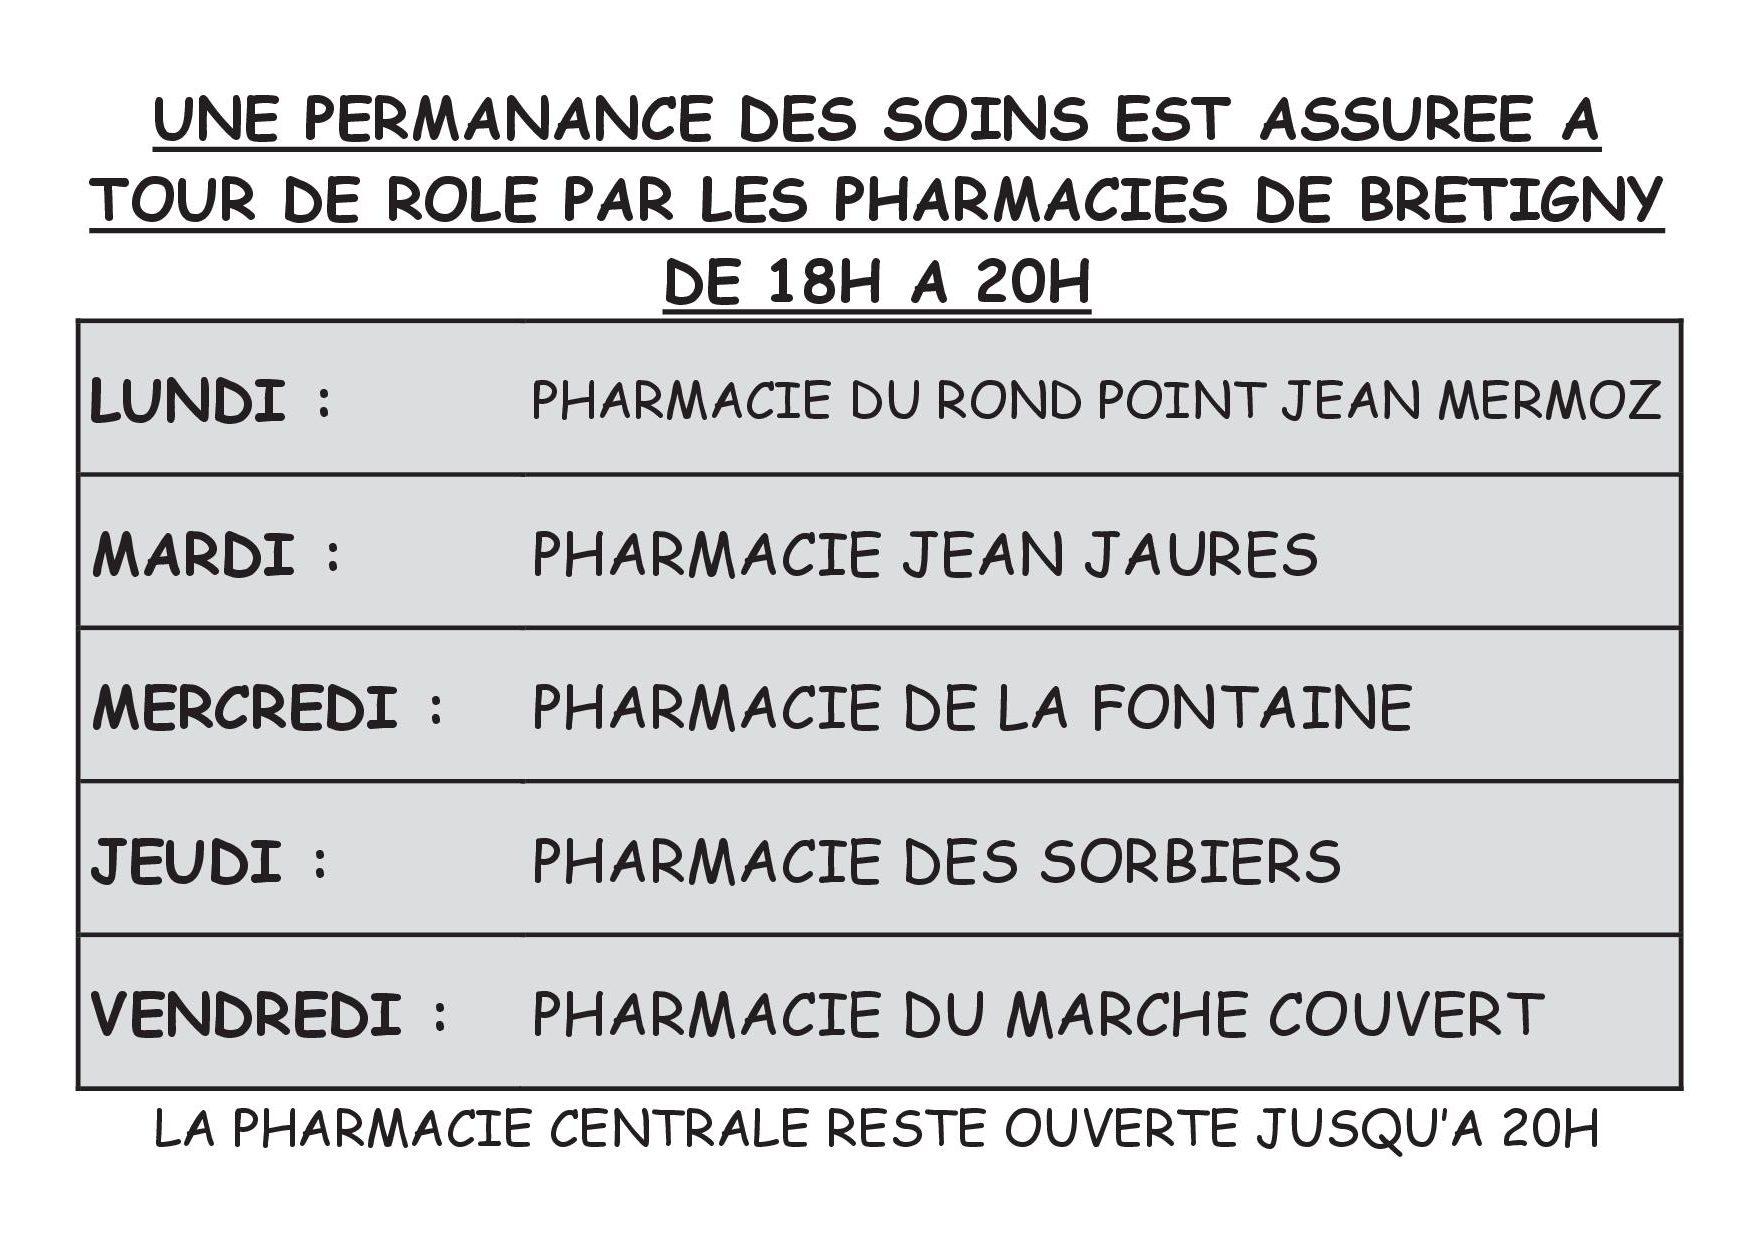 Pharmacie des Sorbiers_COVID-19_Permanence des soins